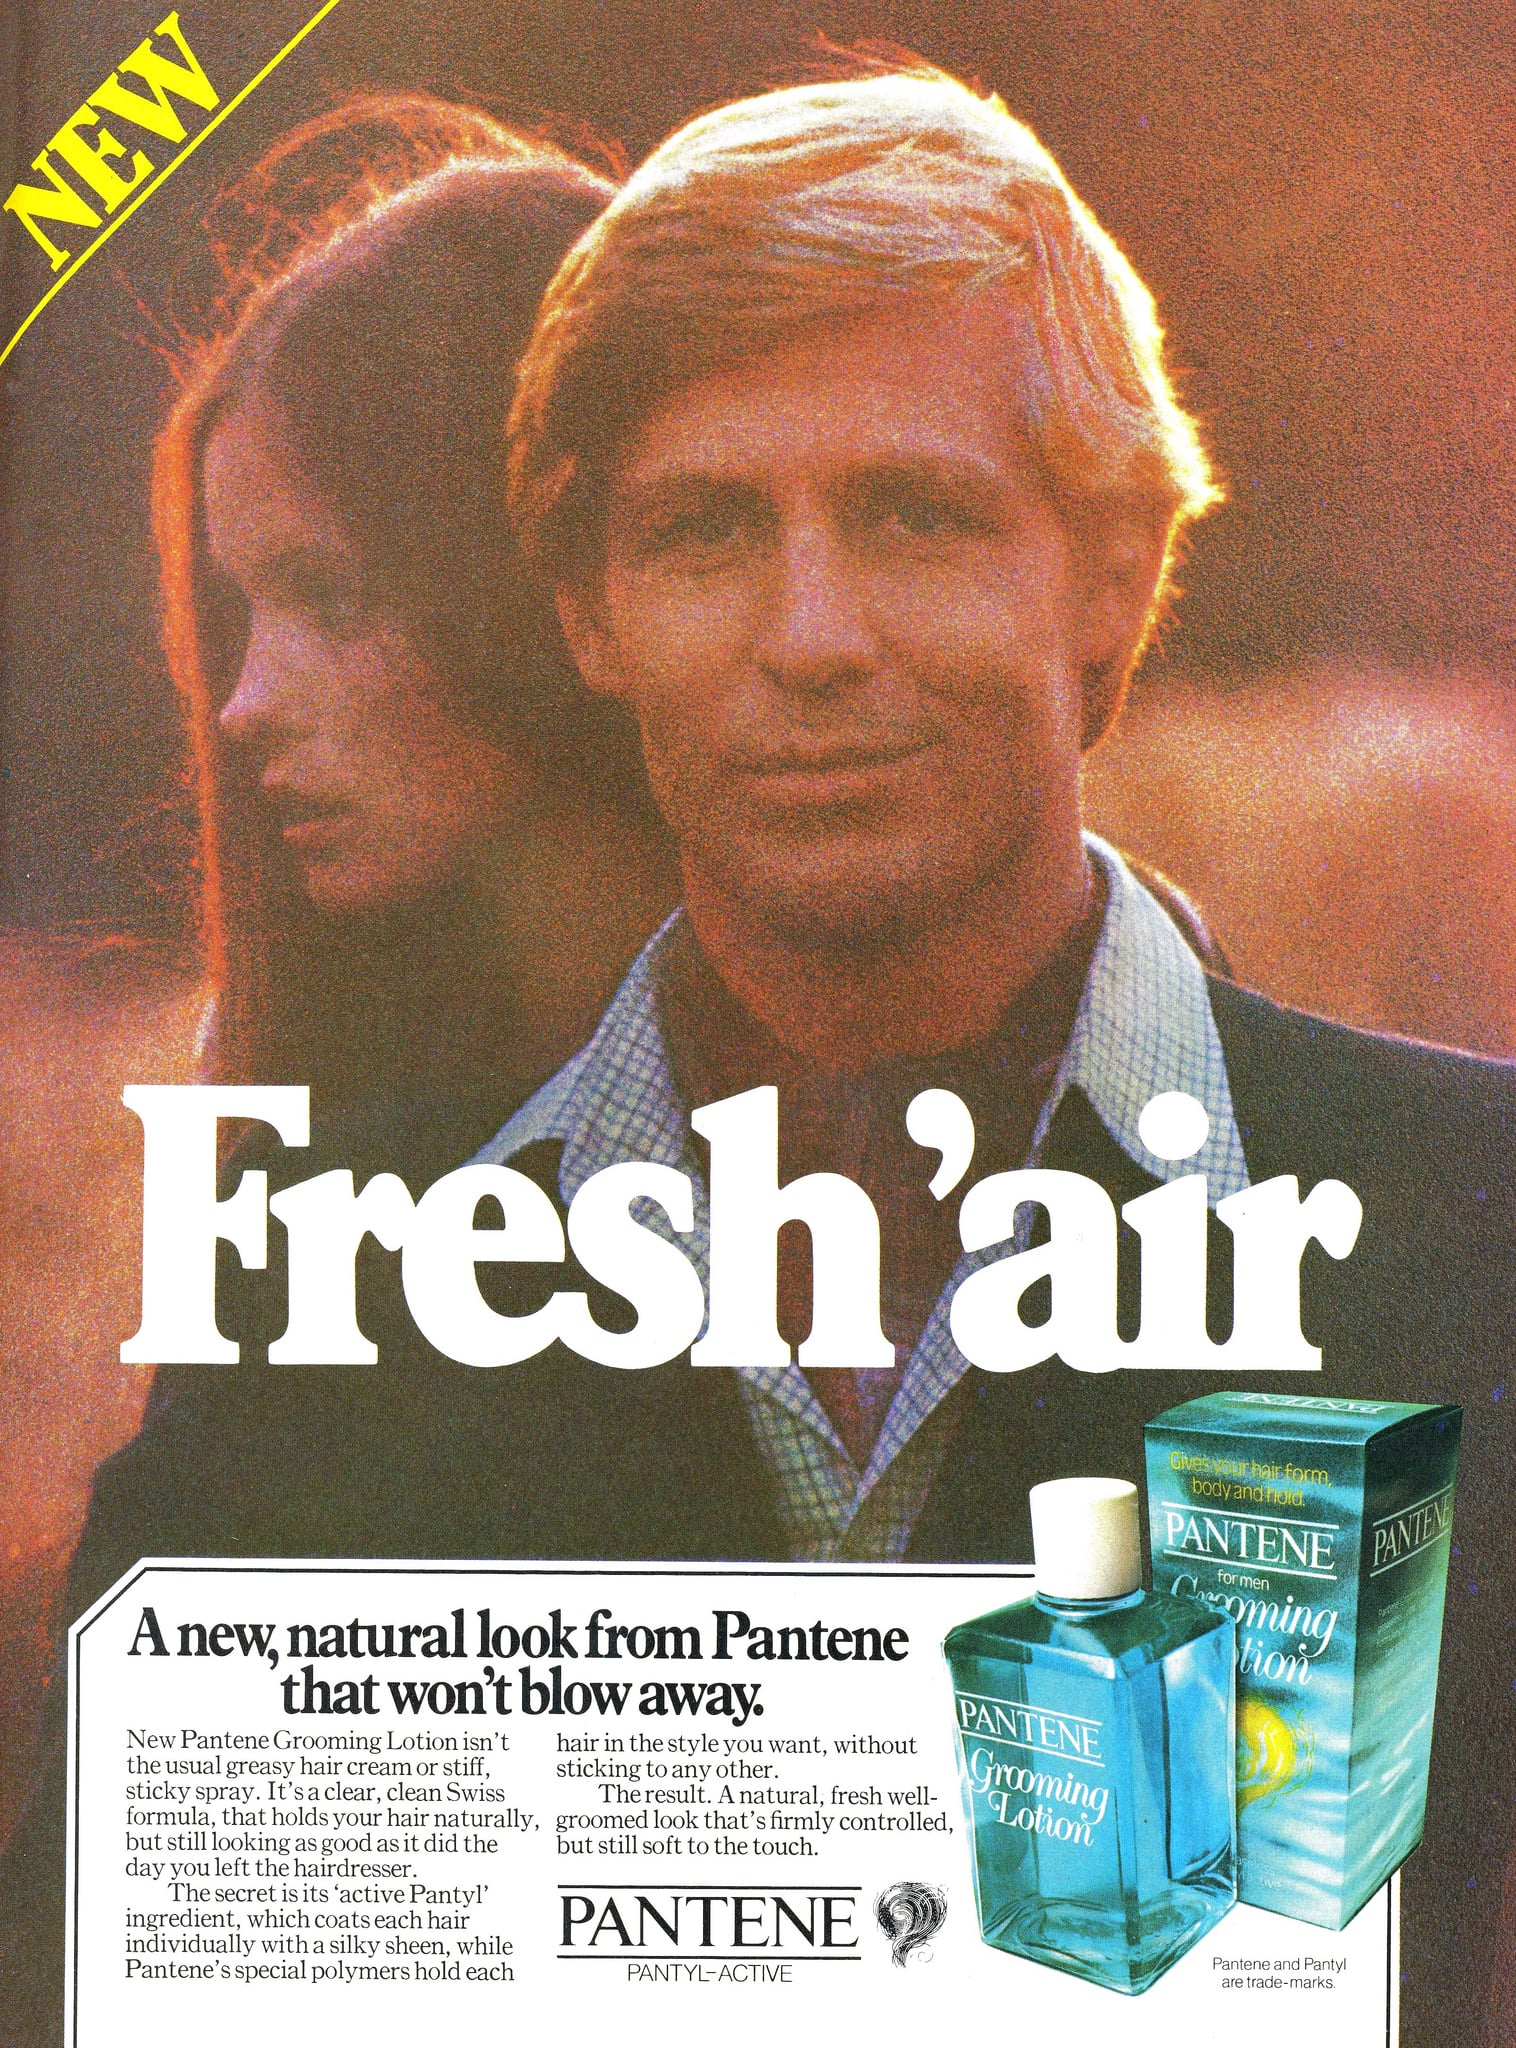 "Yeah, it's definitely that ""fresh 'air"" that makes him one handsome son of a gun."